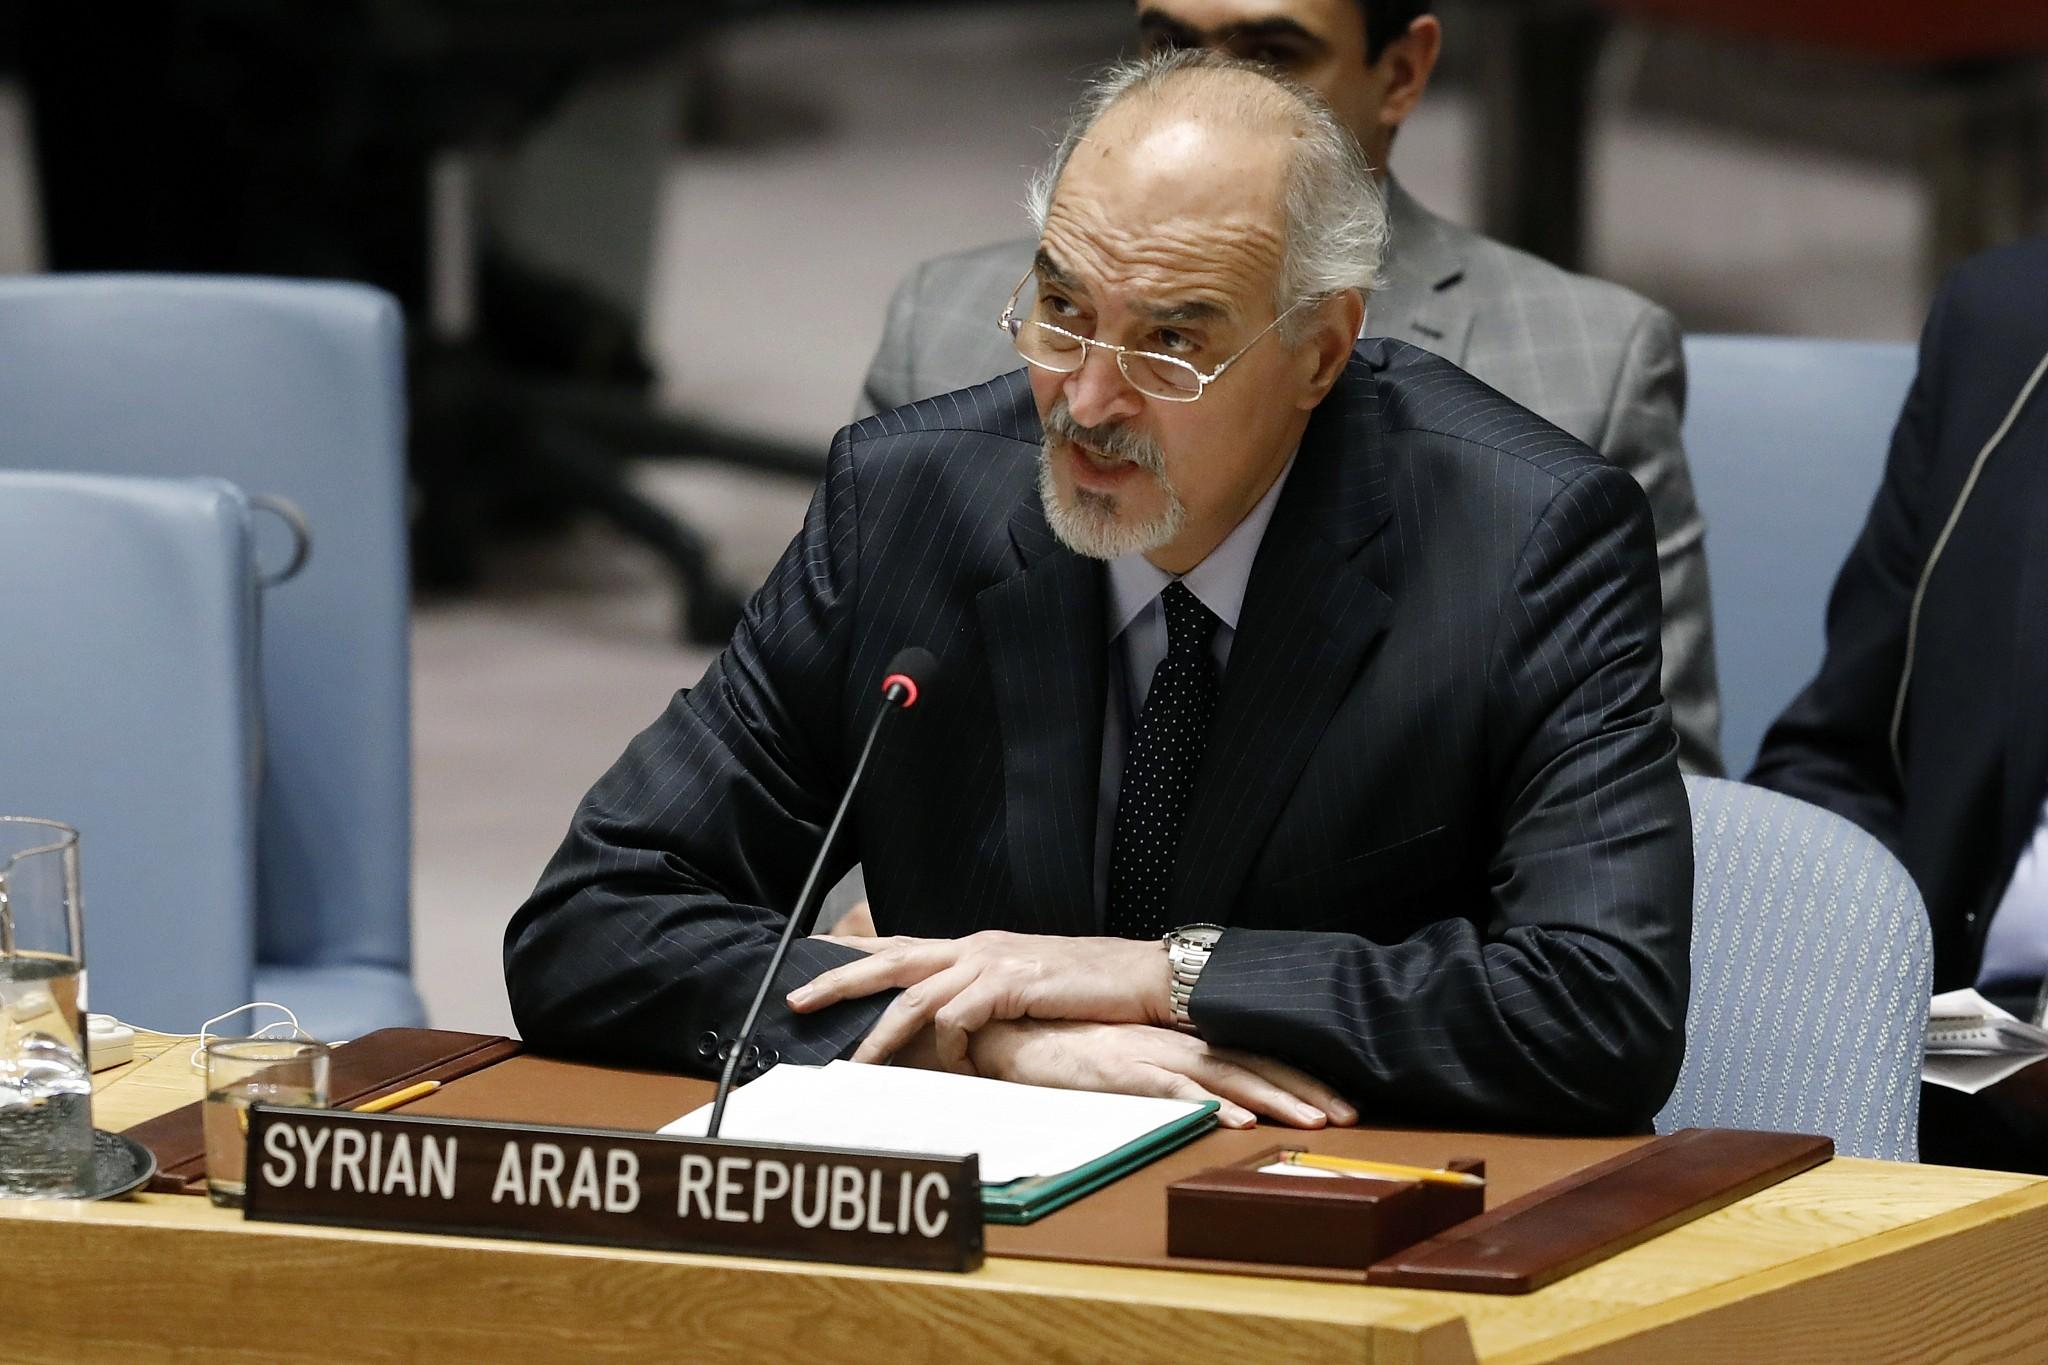 Image result for syria ambassador in un PIC